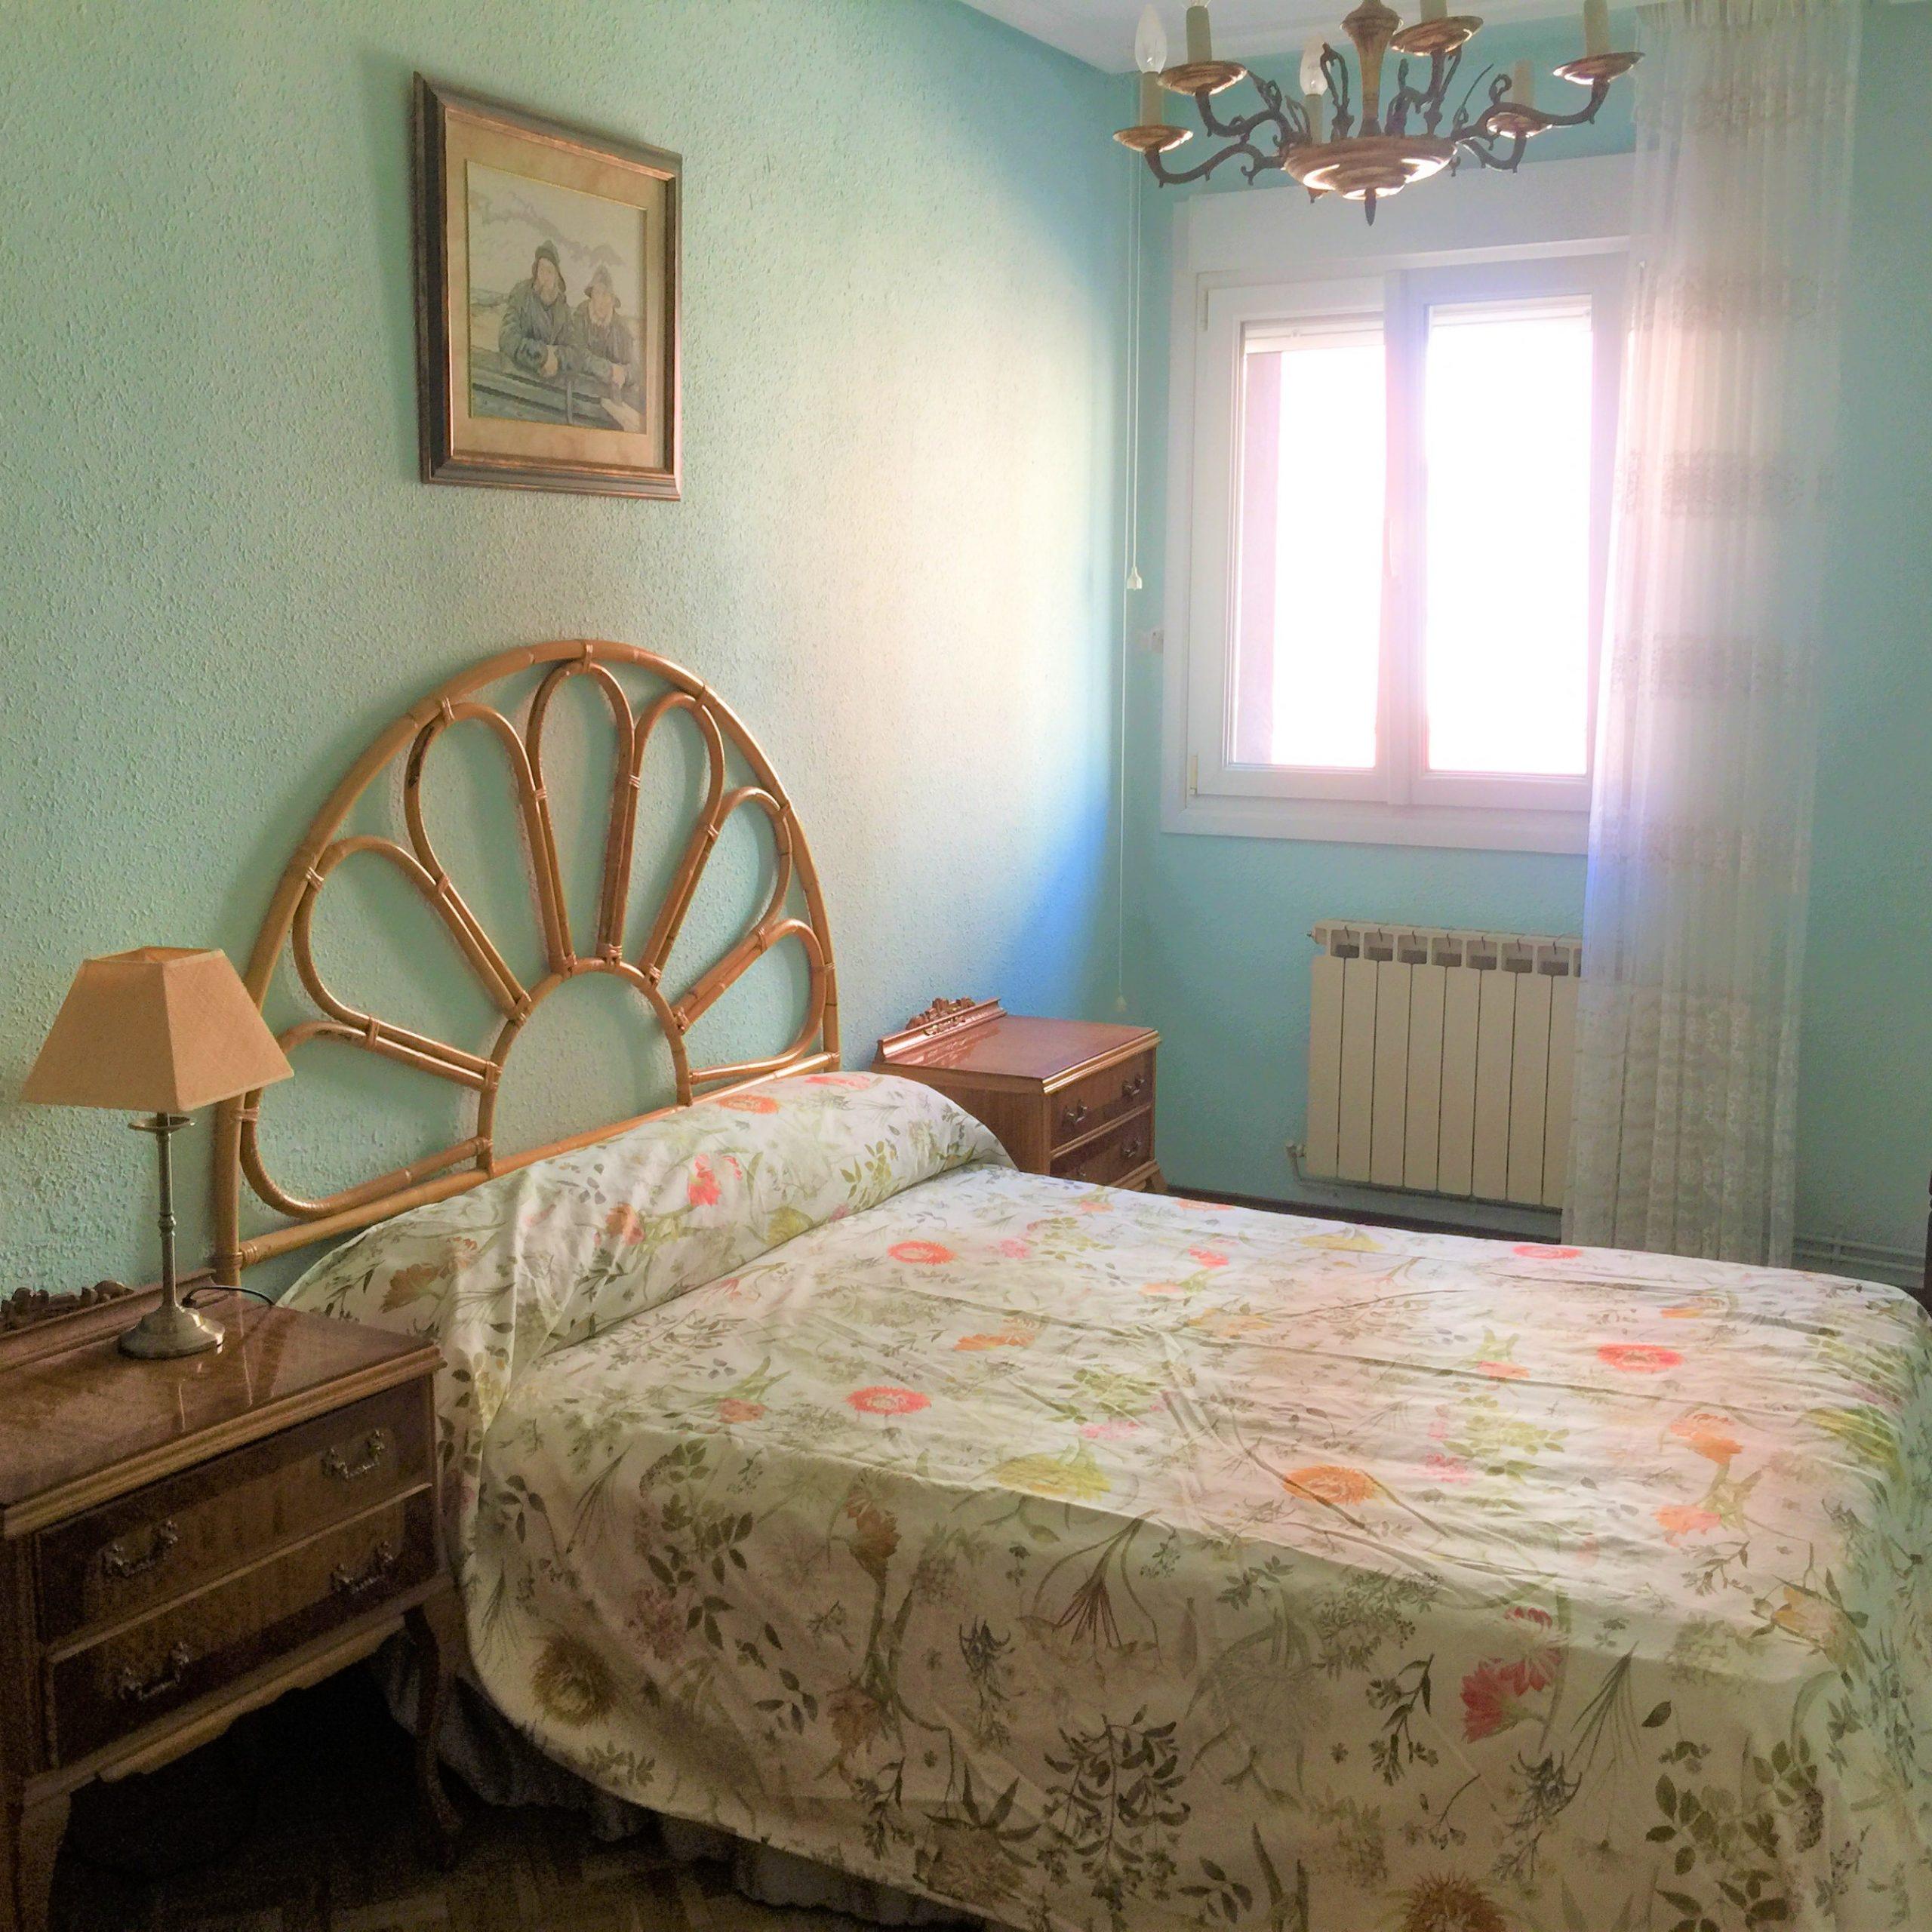 Virgen del río - 3 bedroom flat in Pamplona